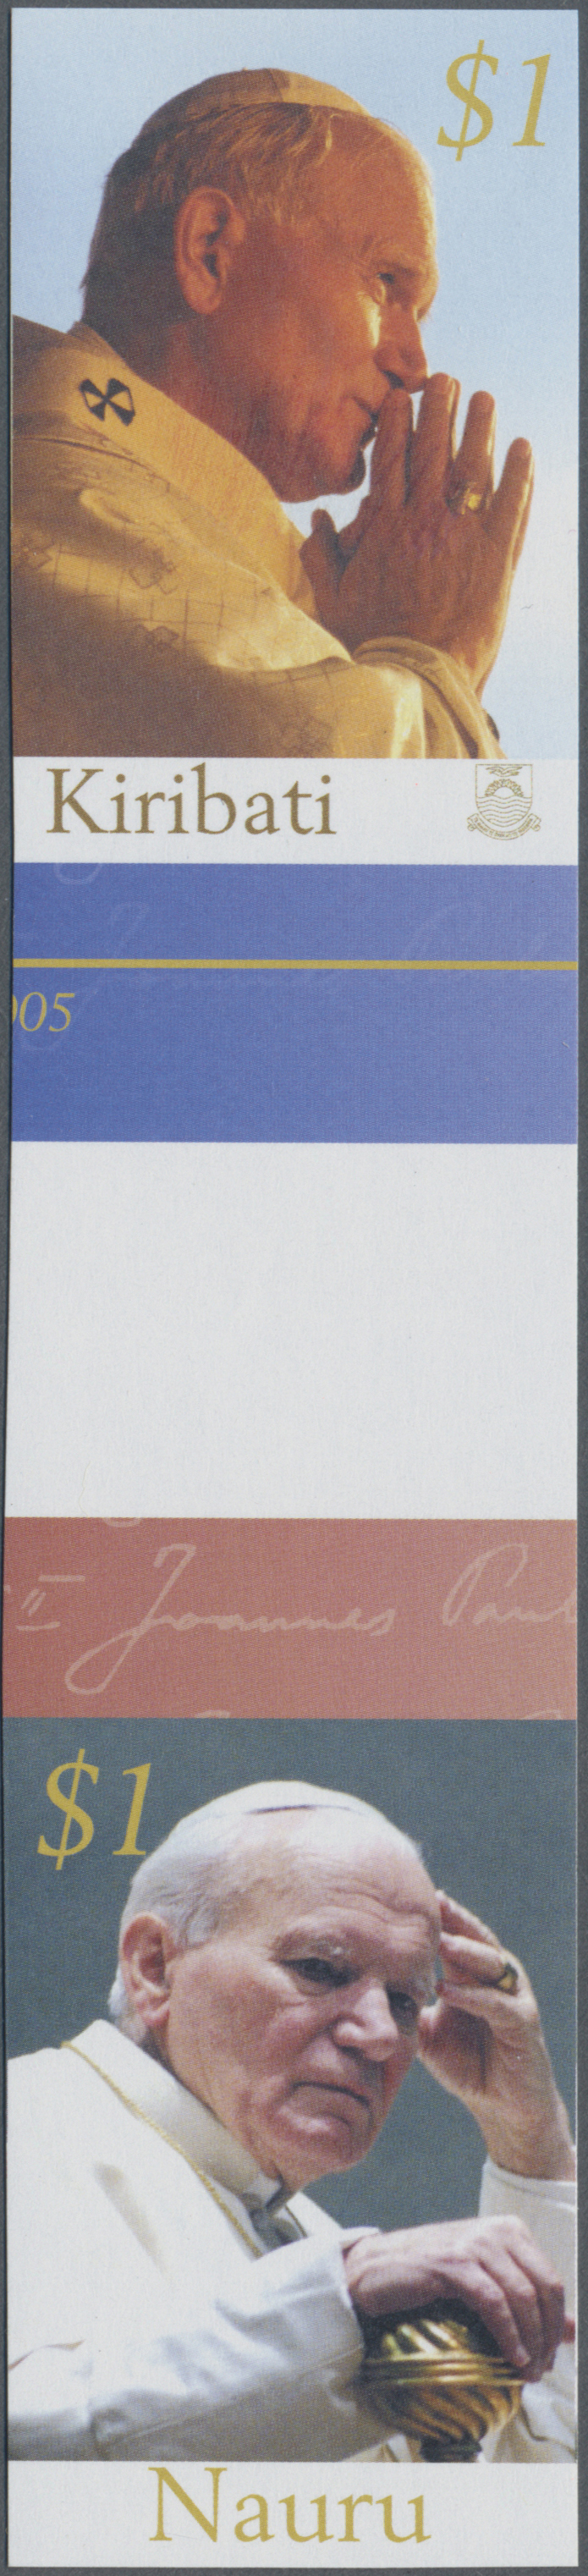 Lot 09331 - thematik: religion / religion  -  Auktionshaus Christoph Gärtner GmbH & Co. KG Sale #45- ASIA/OVERSEAS/EUROPE